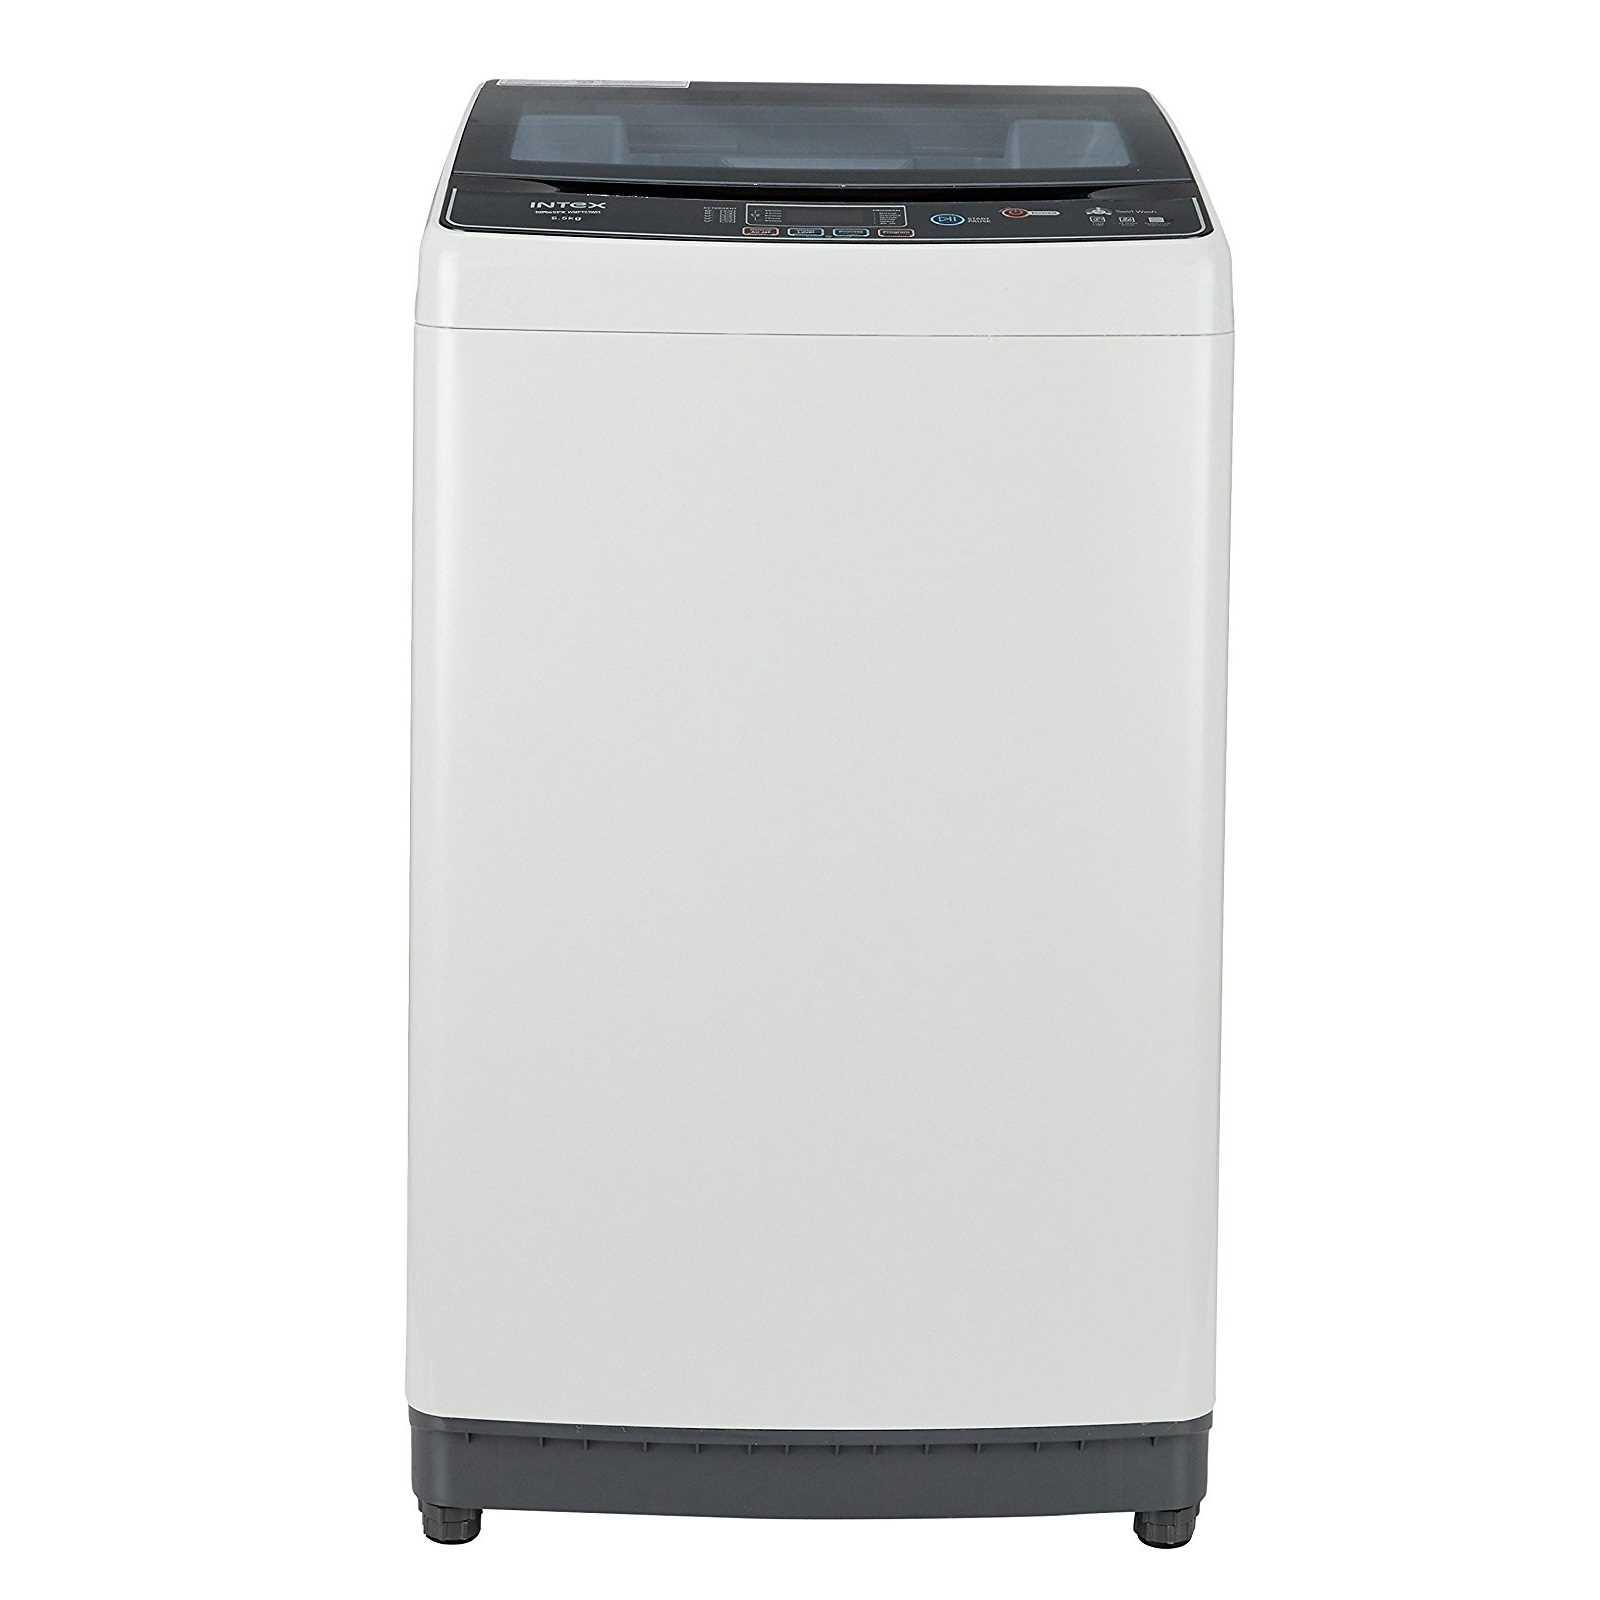 Intex WMFT65WH 6.5 Kg Fully Automatic Top Loading Washing Machine